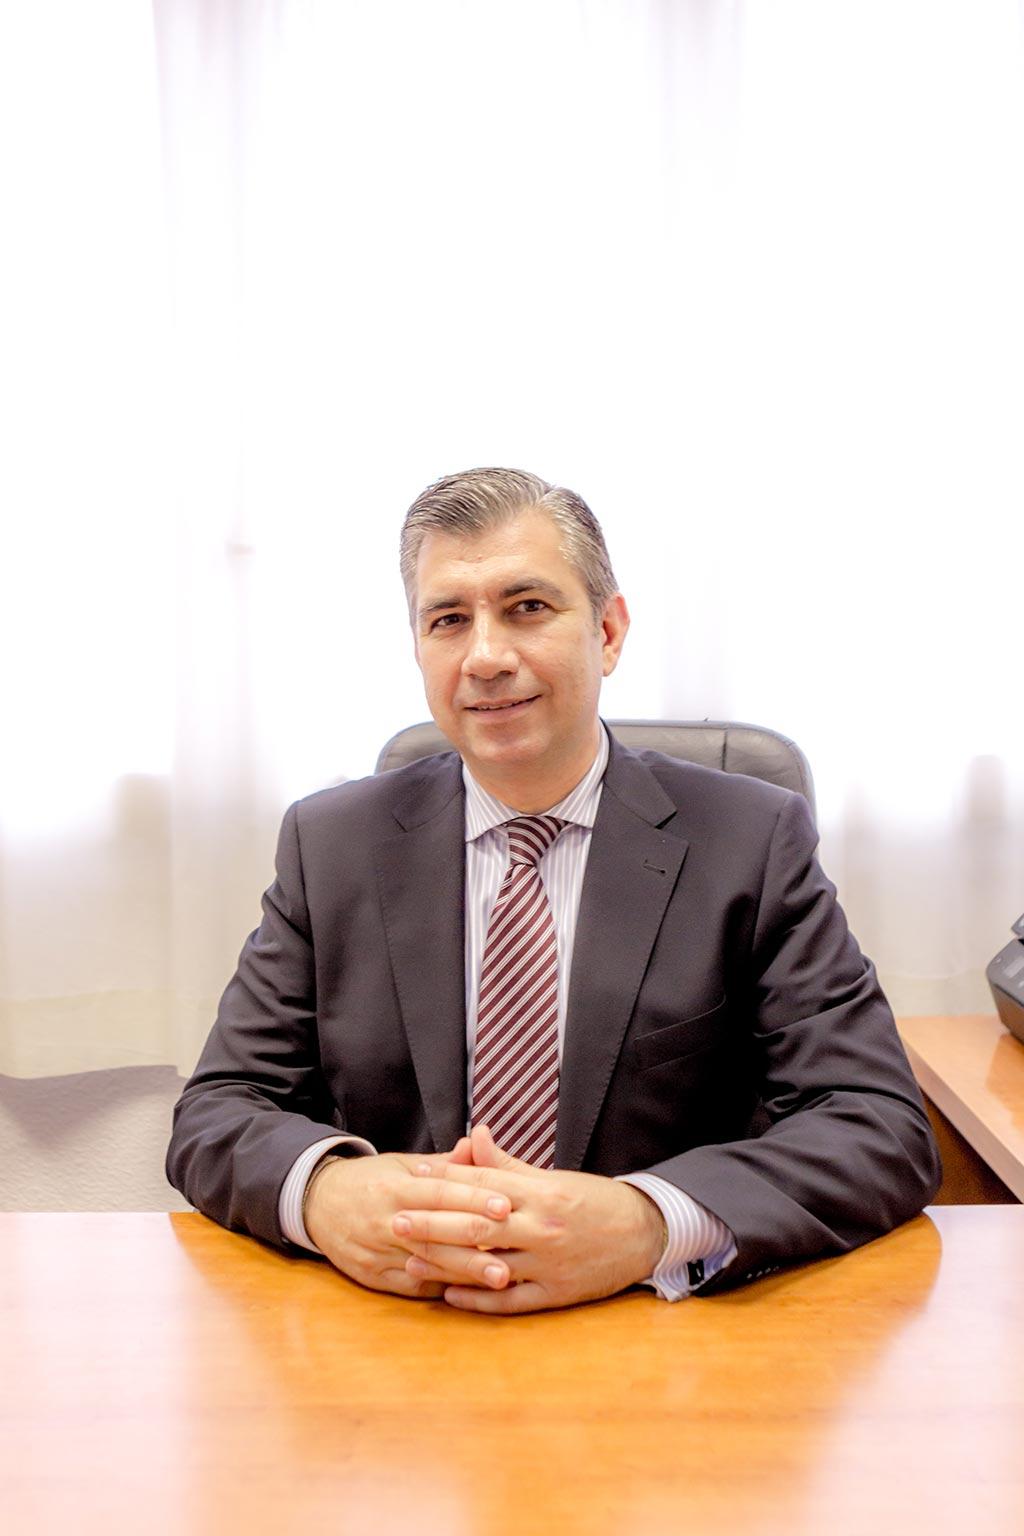 Antonio Vargas abogado zaragoza